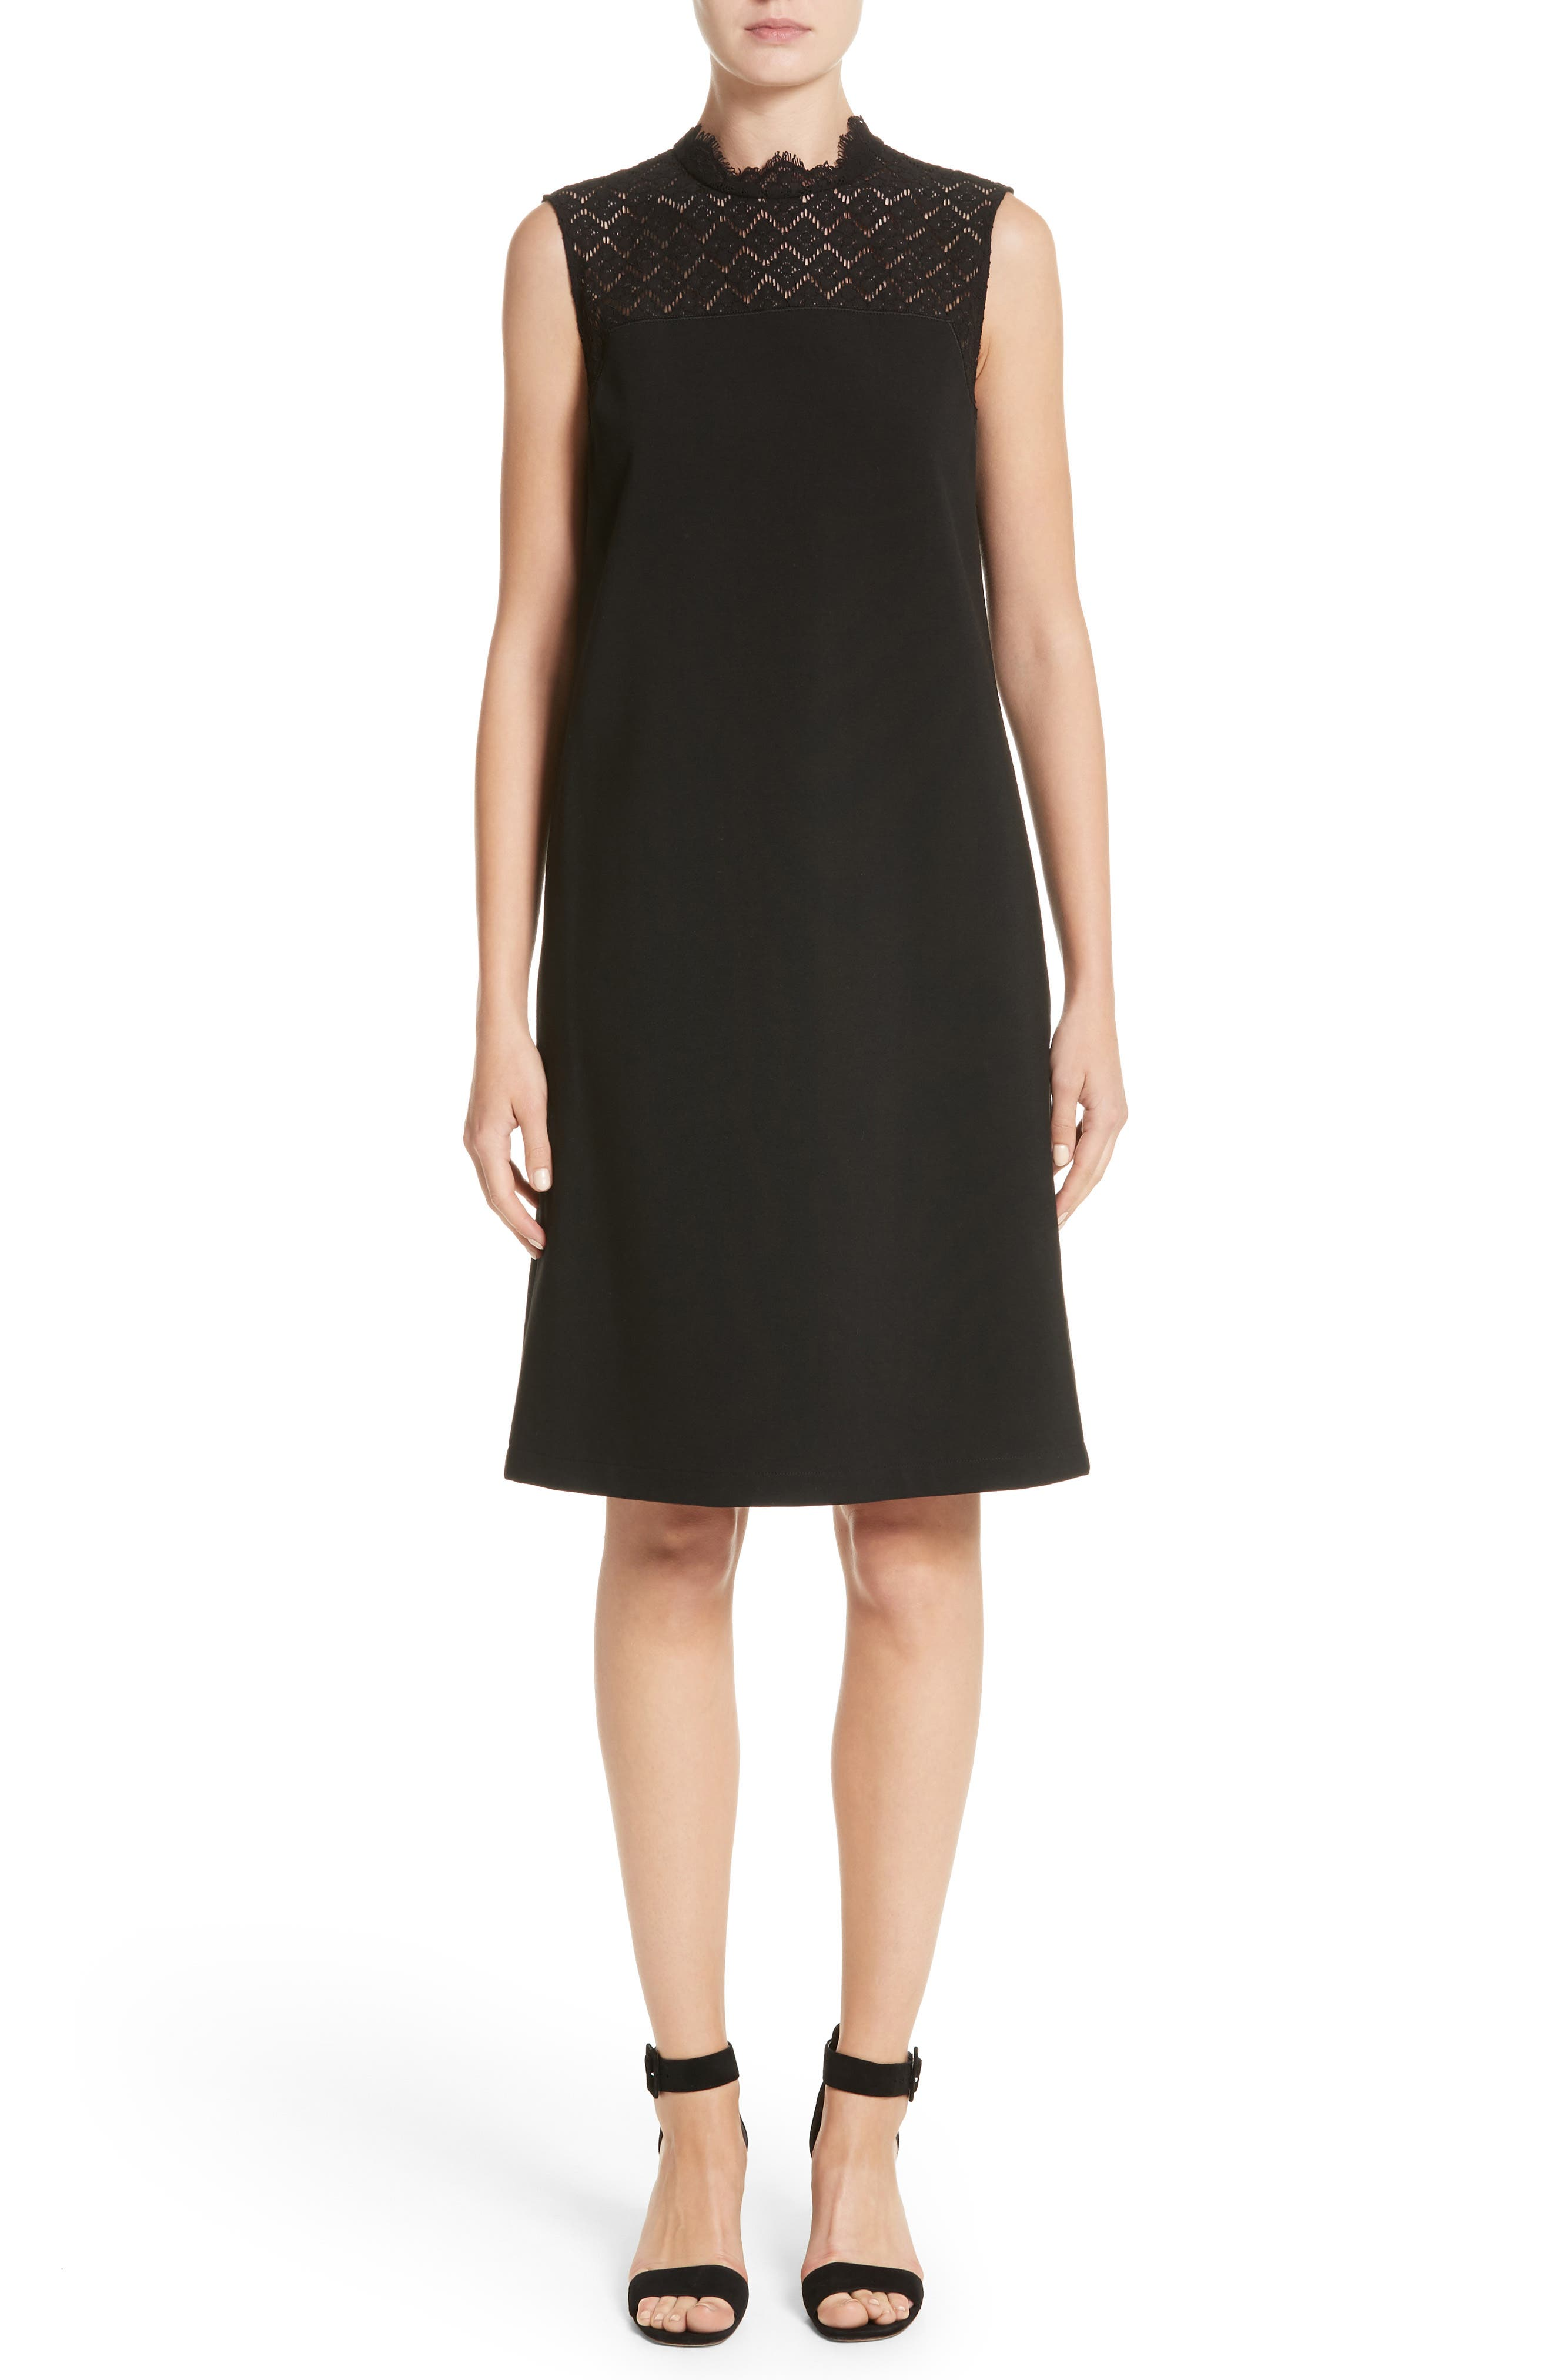 Lafayette 148 New York Ines Lace Trim Shift Dress